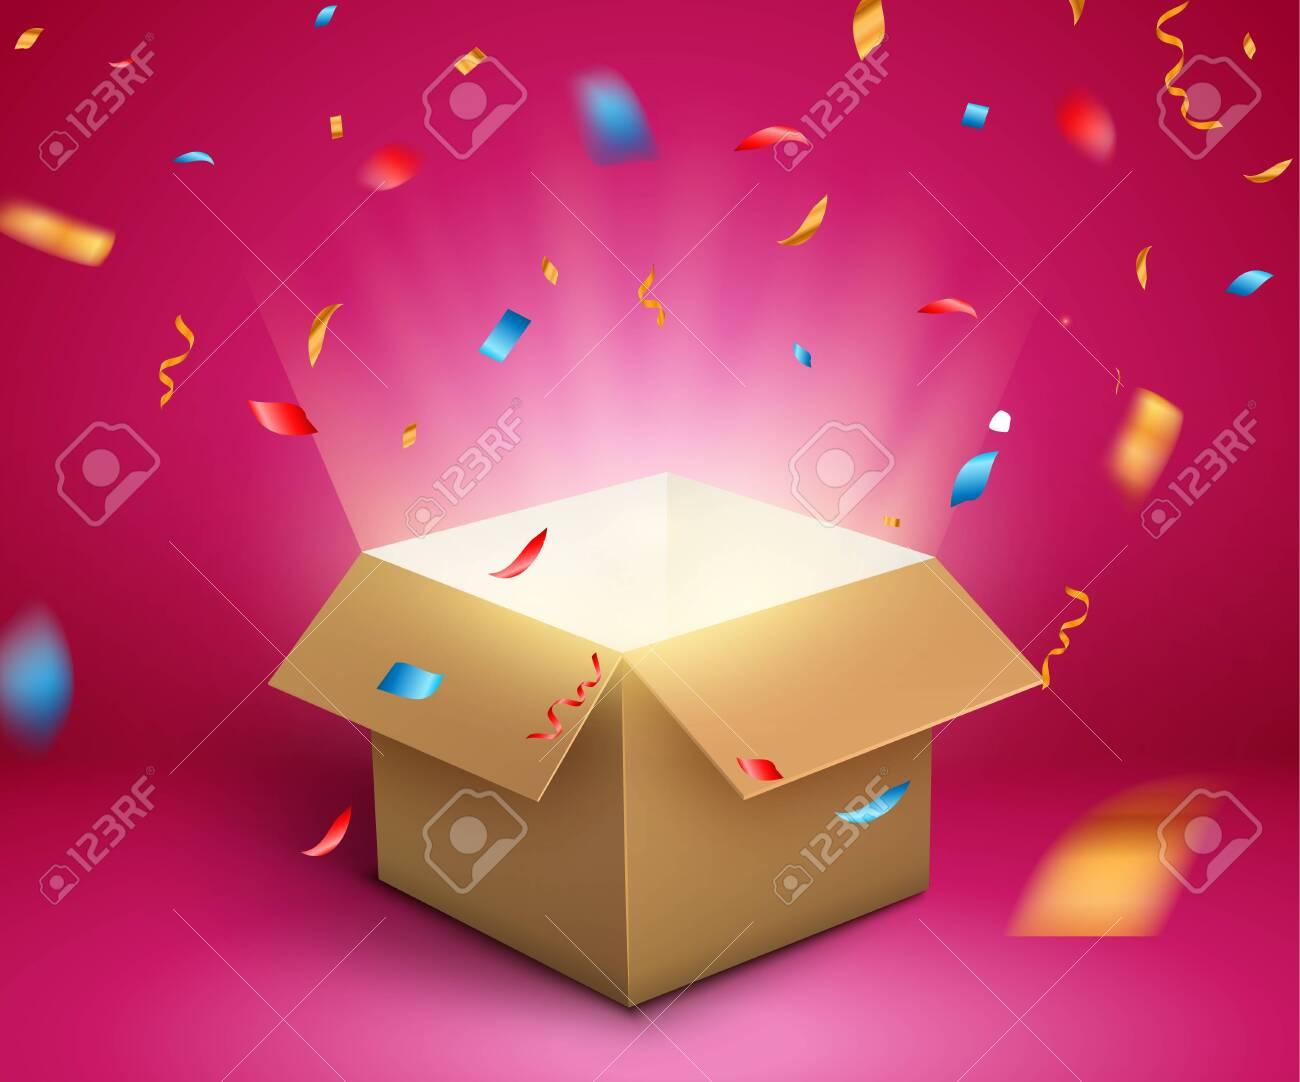 Gift box confetti explosion. Magic open surprise gift box package decoration. - 139624878